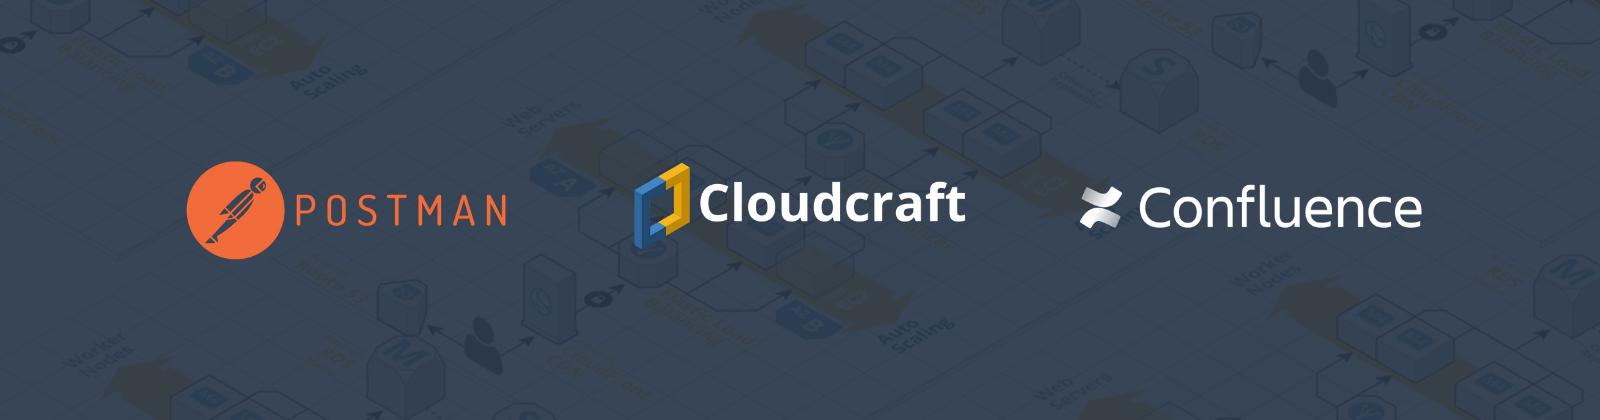 Postman and Cloudcraft Blog Series pt 1